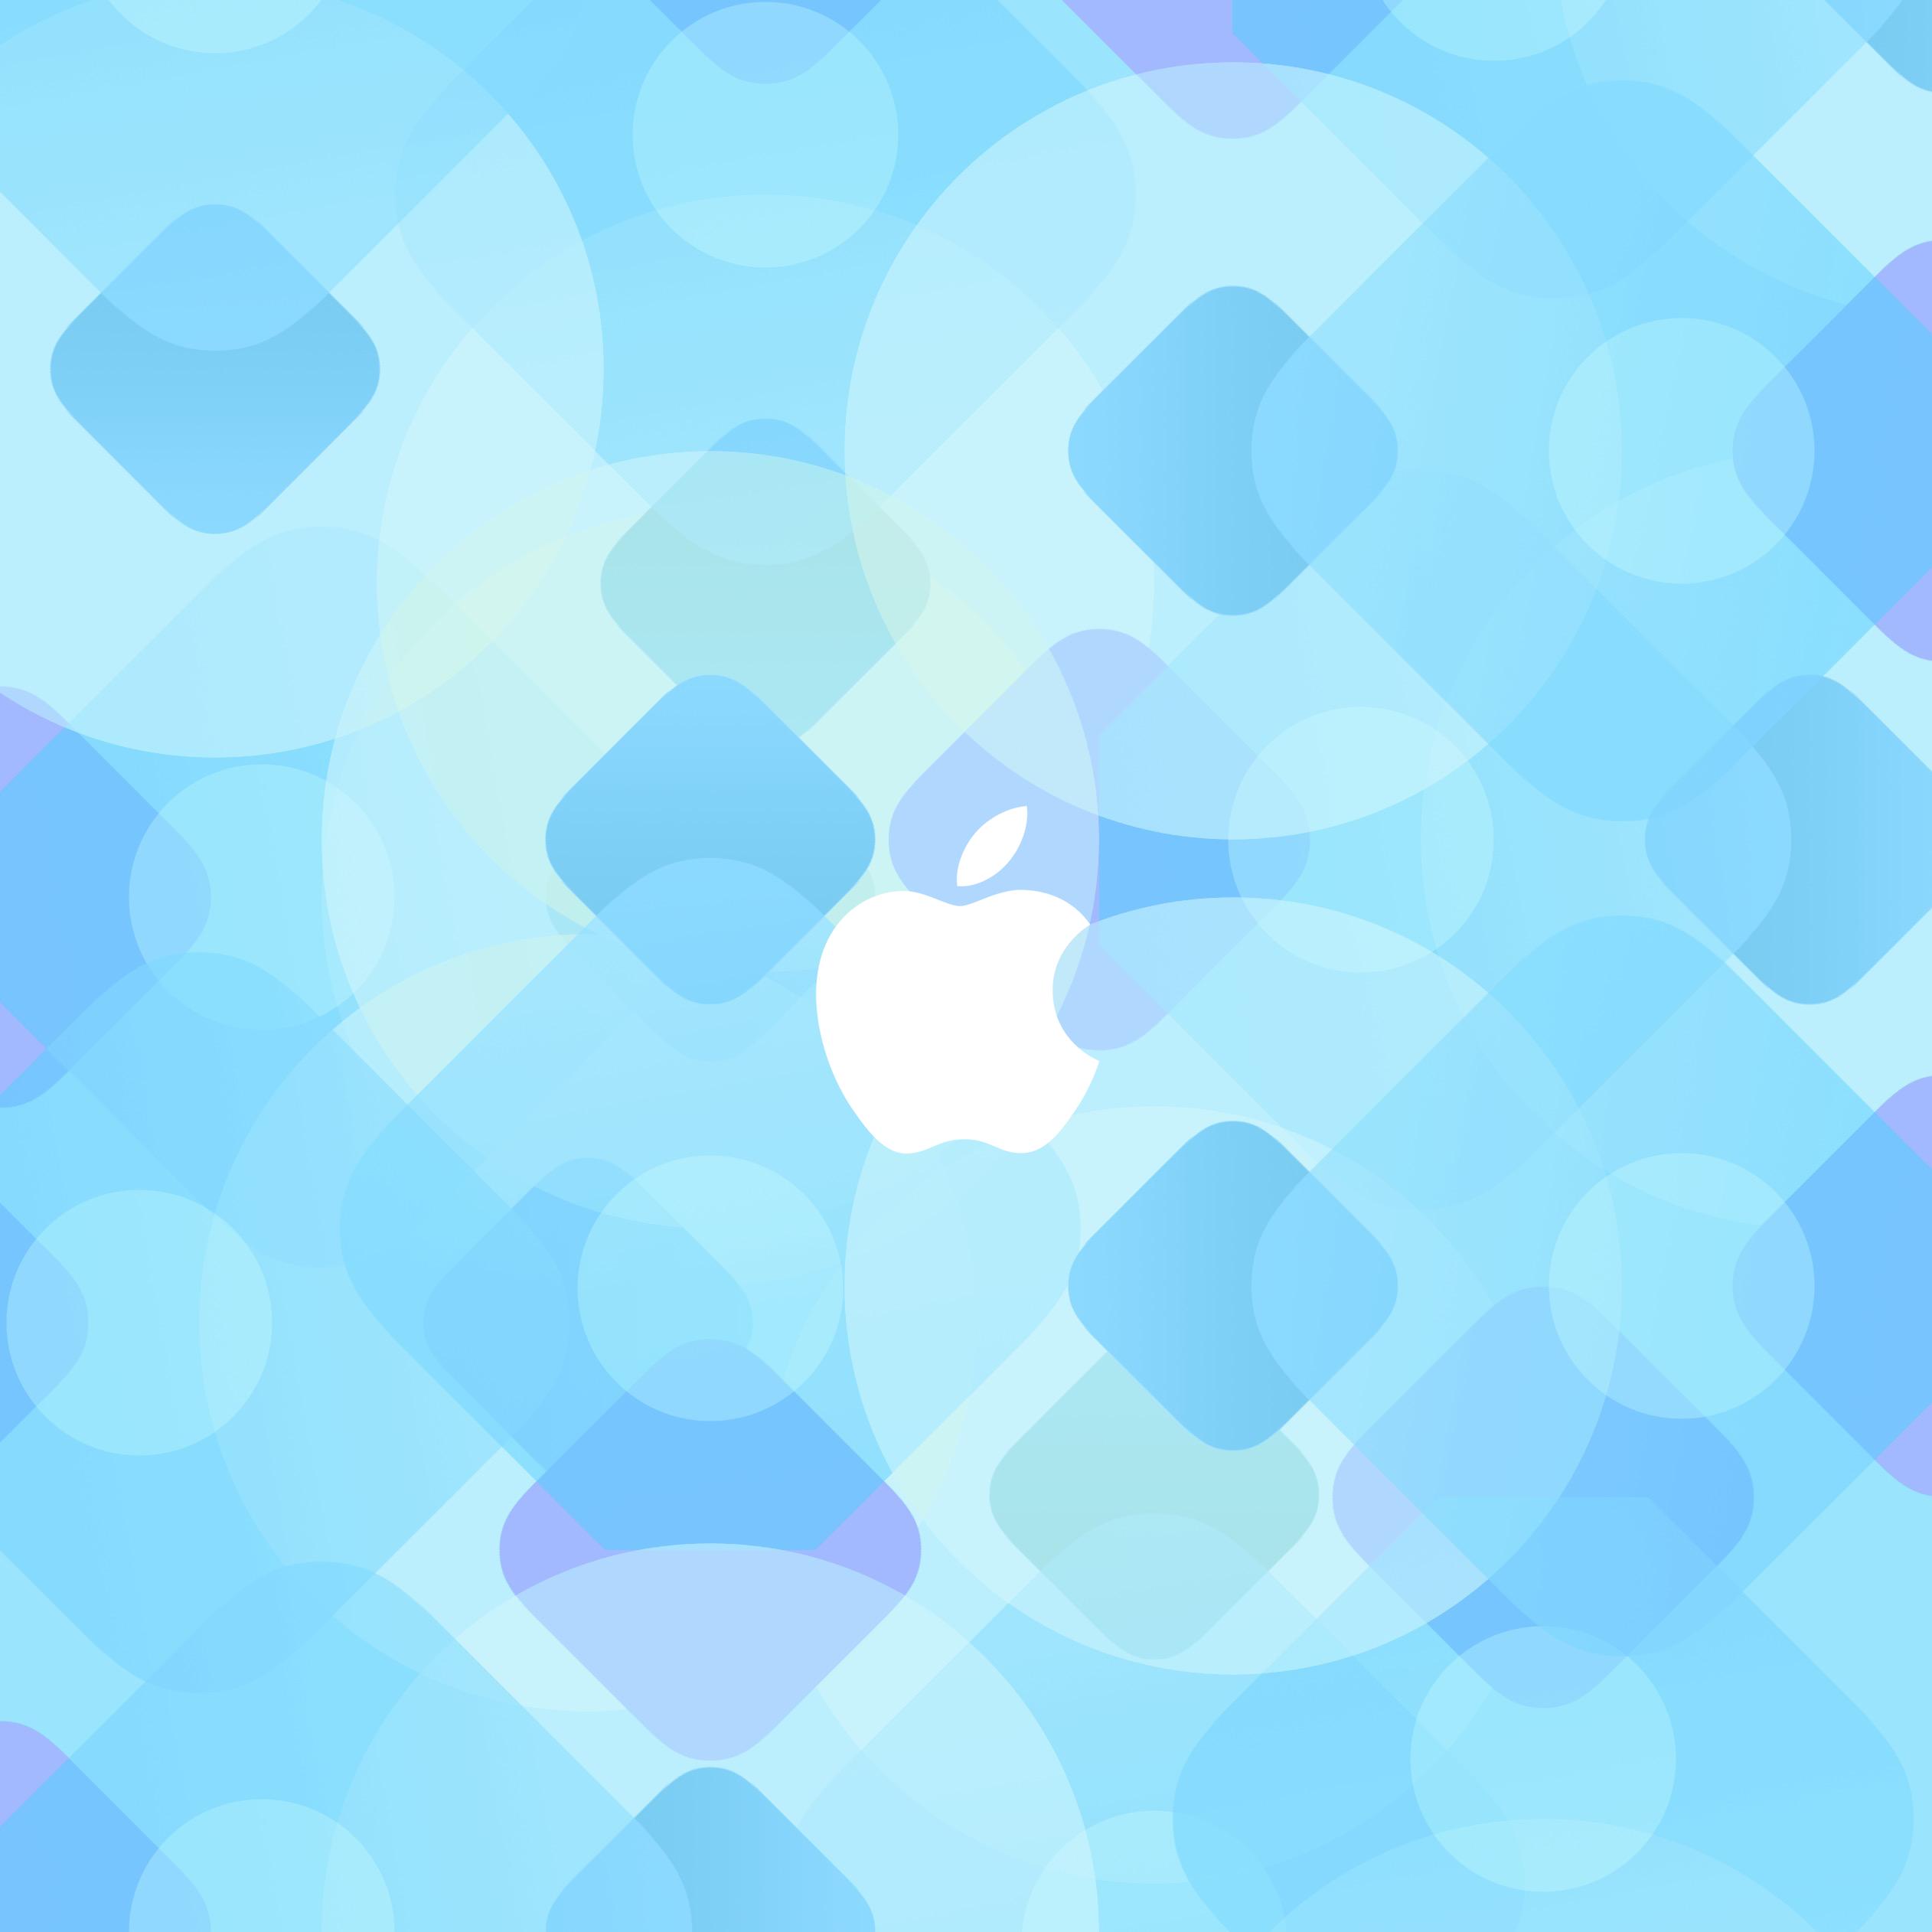 Fresh wwdc 2015 wallpapers - Original apple logo wallpaper ...